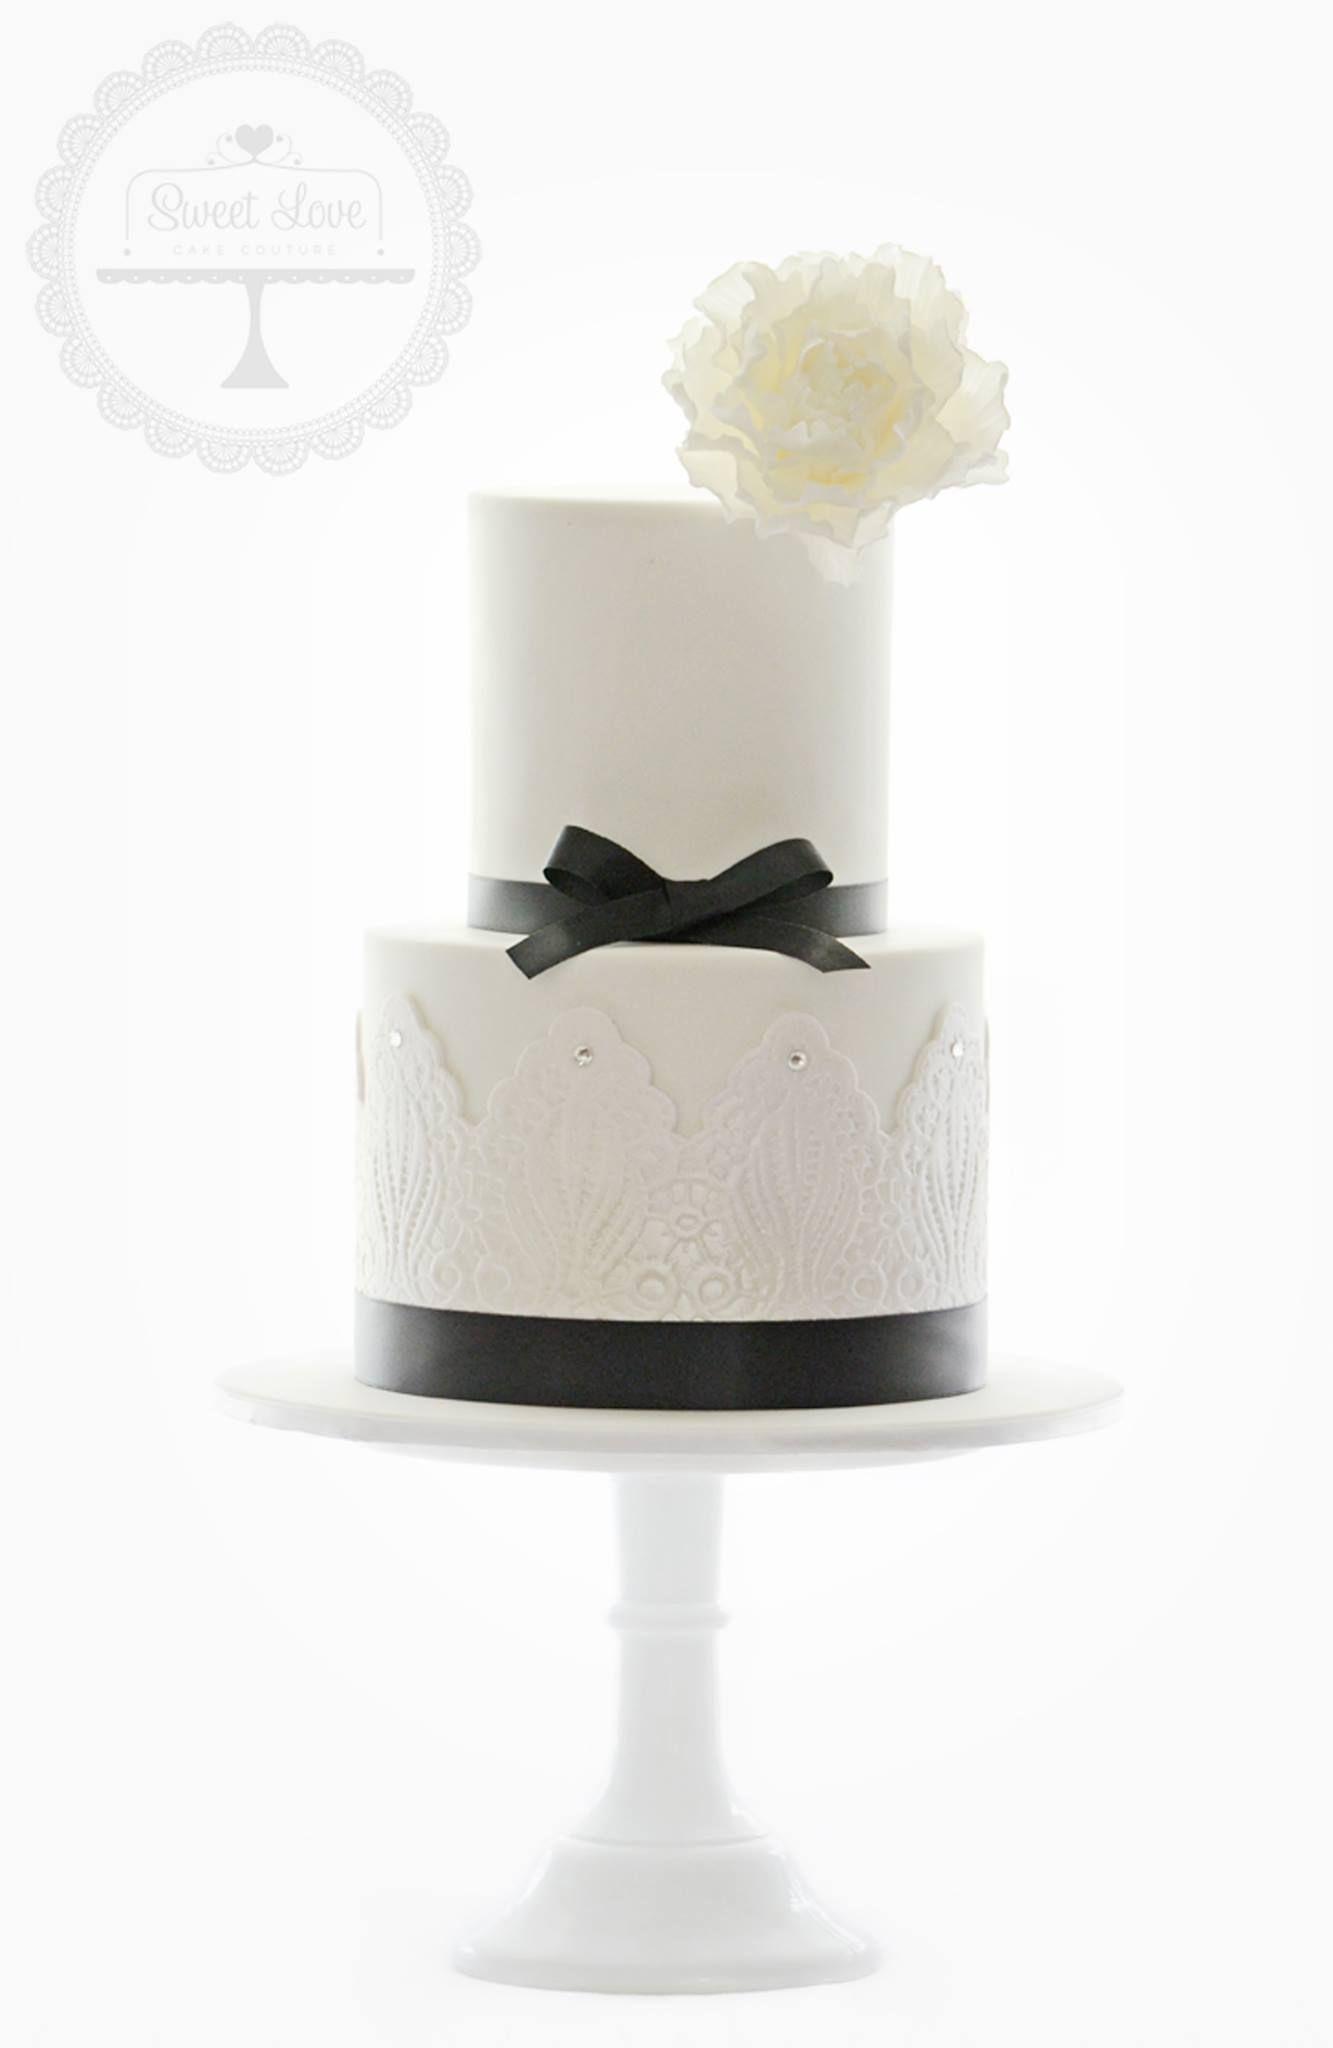 Sweet Love Cake Couture | Wedding Cakes | Pinterest | Amazing cakes ...